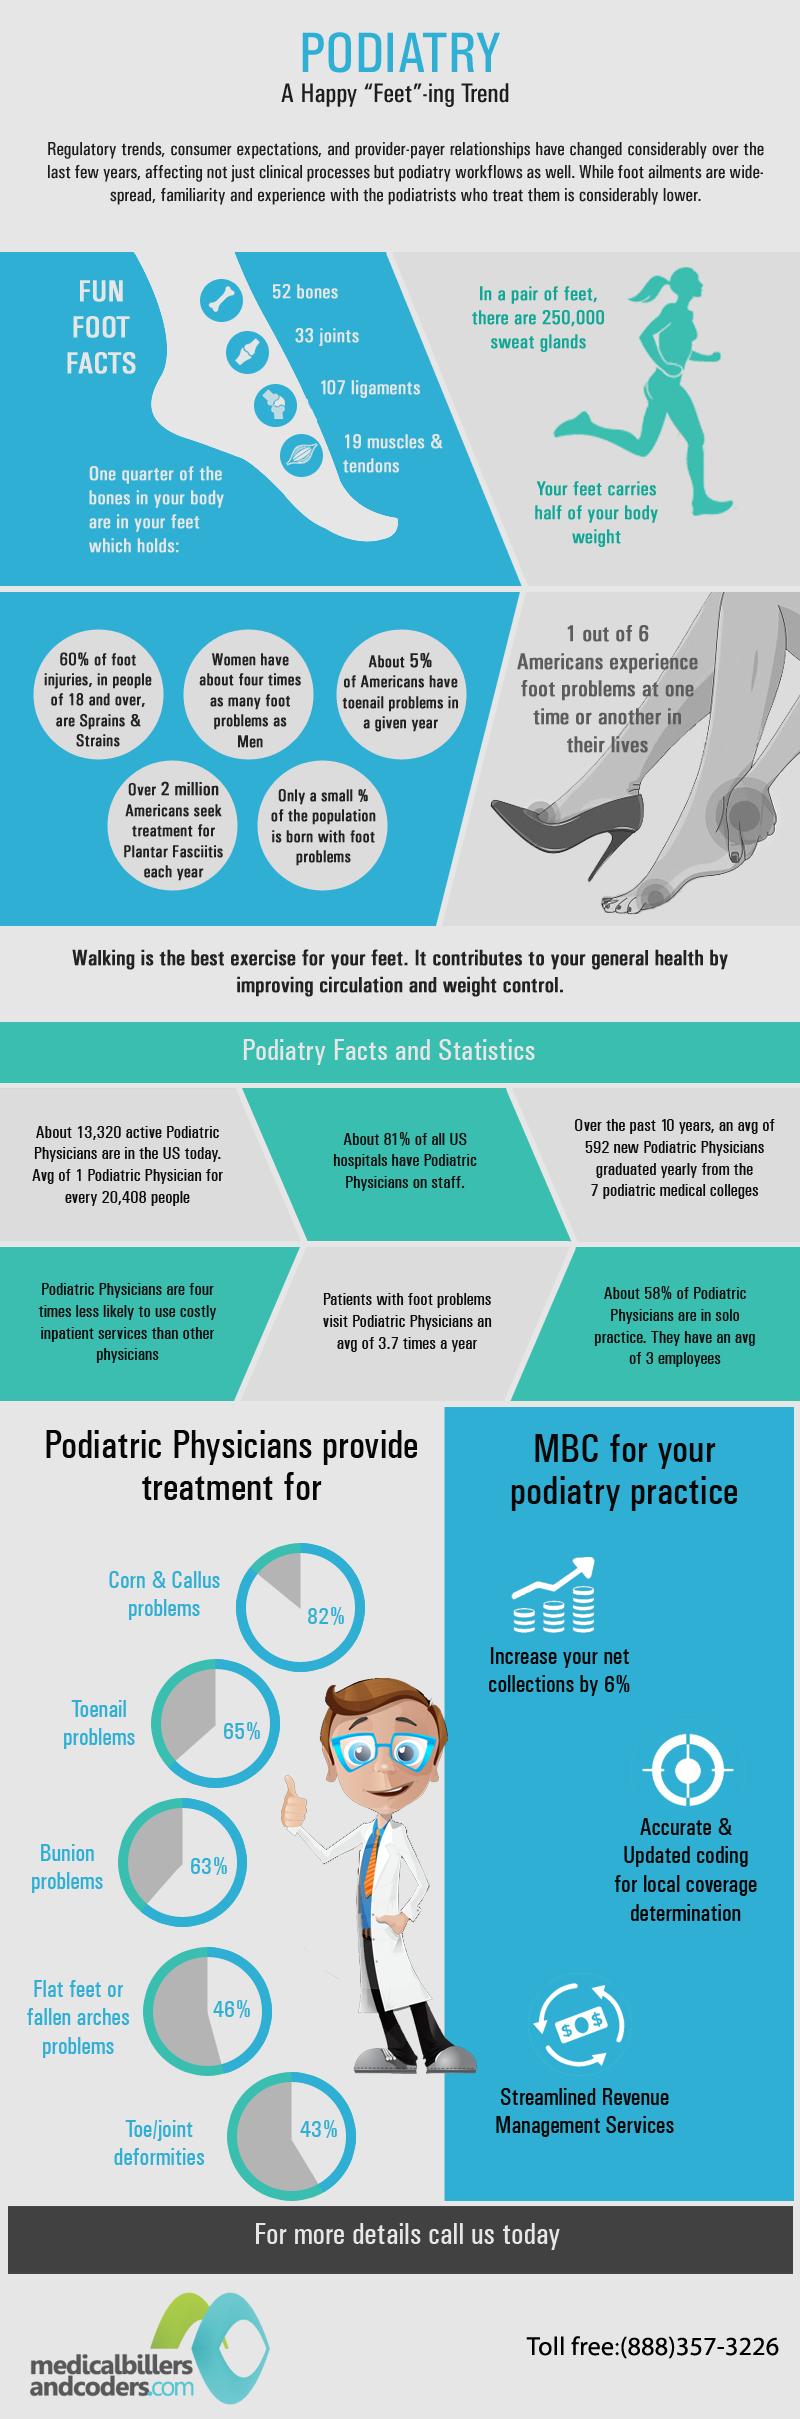 Podiatry medical billing